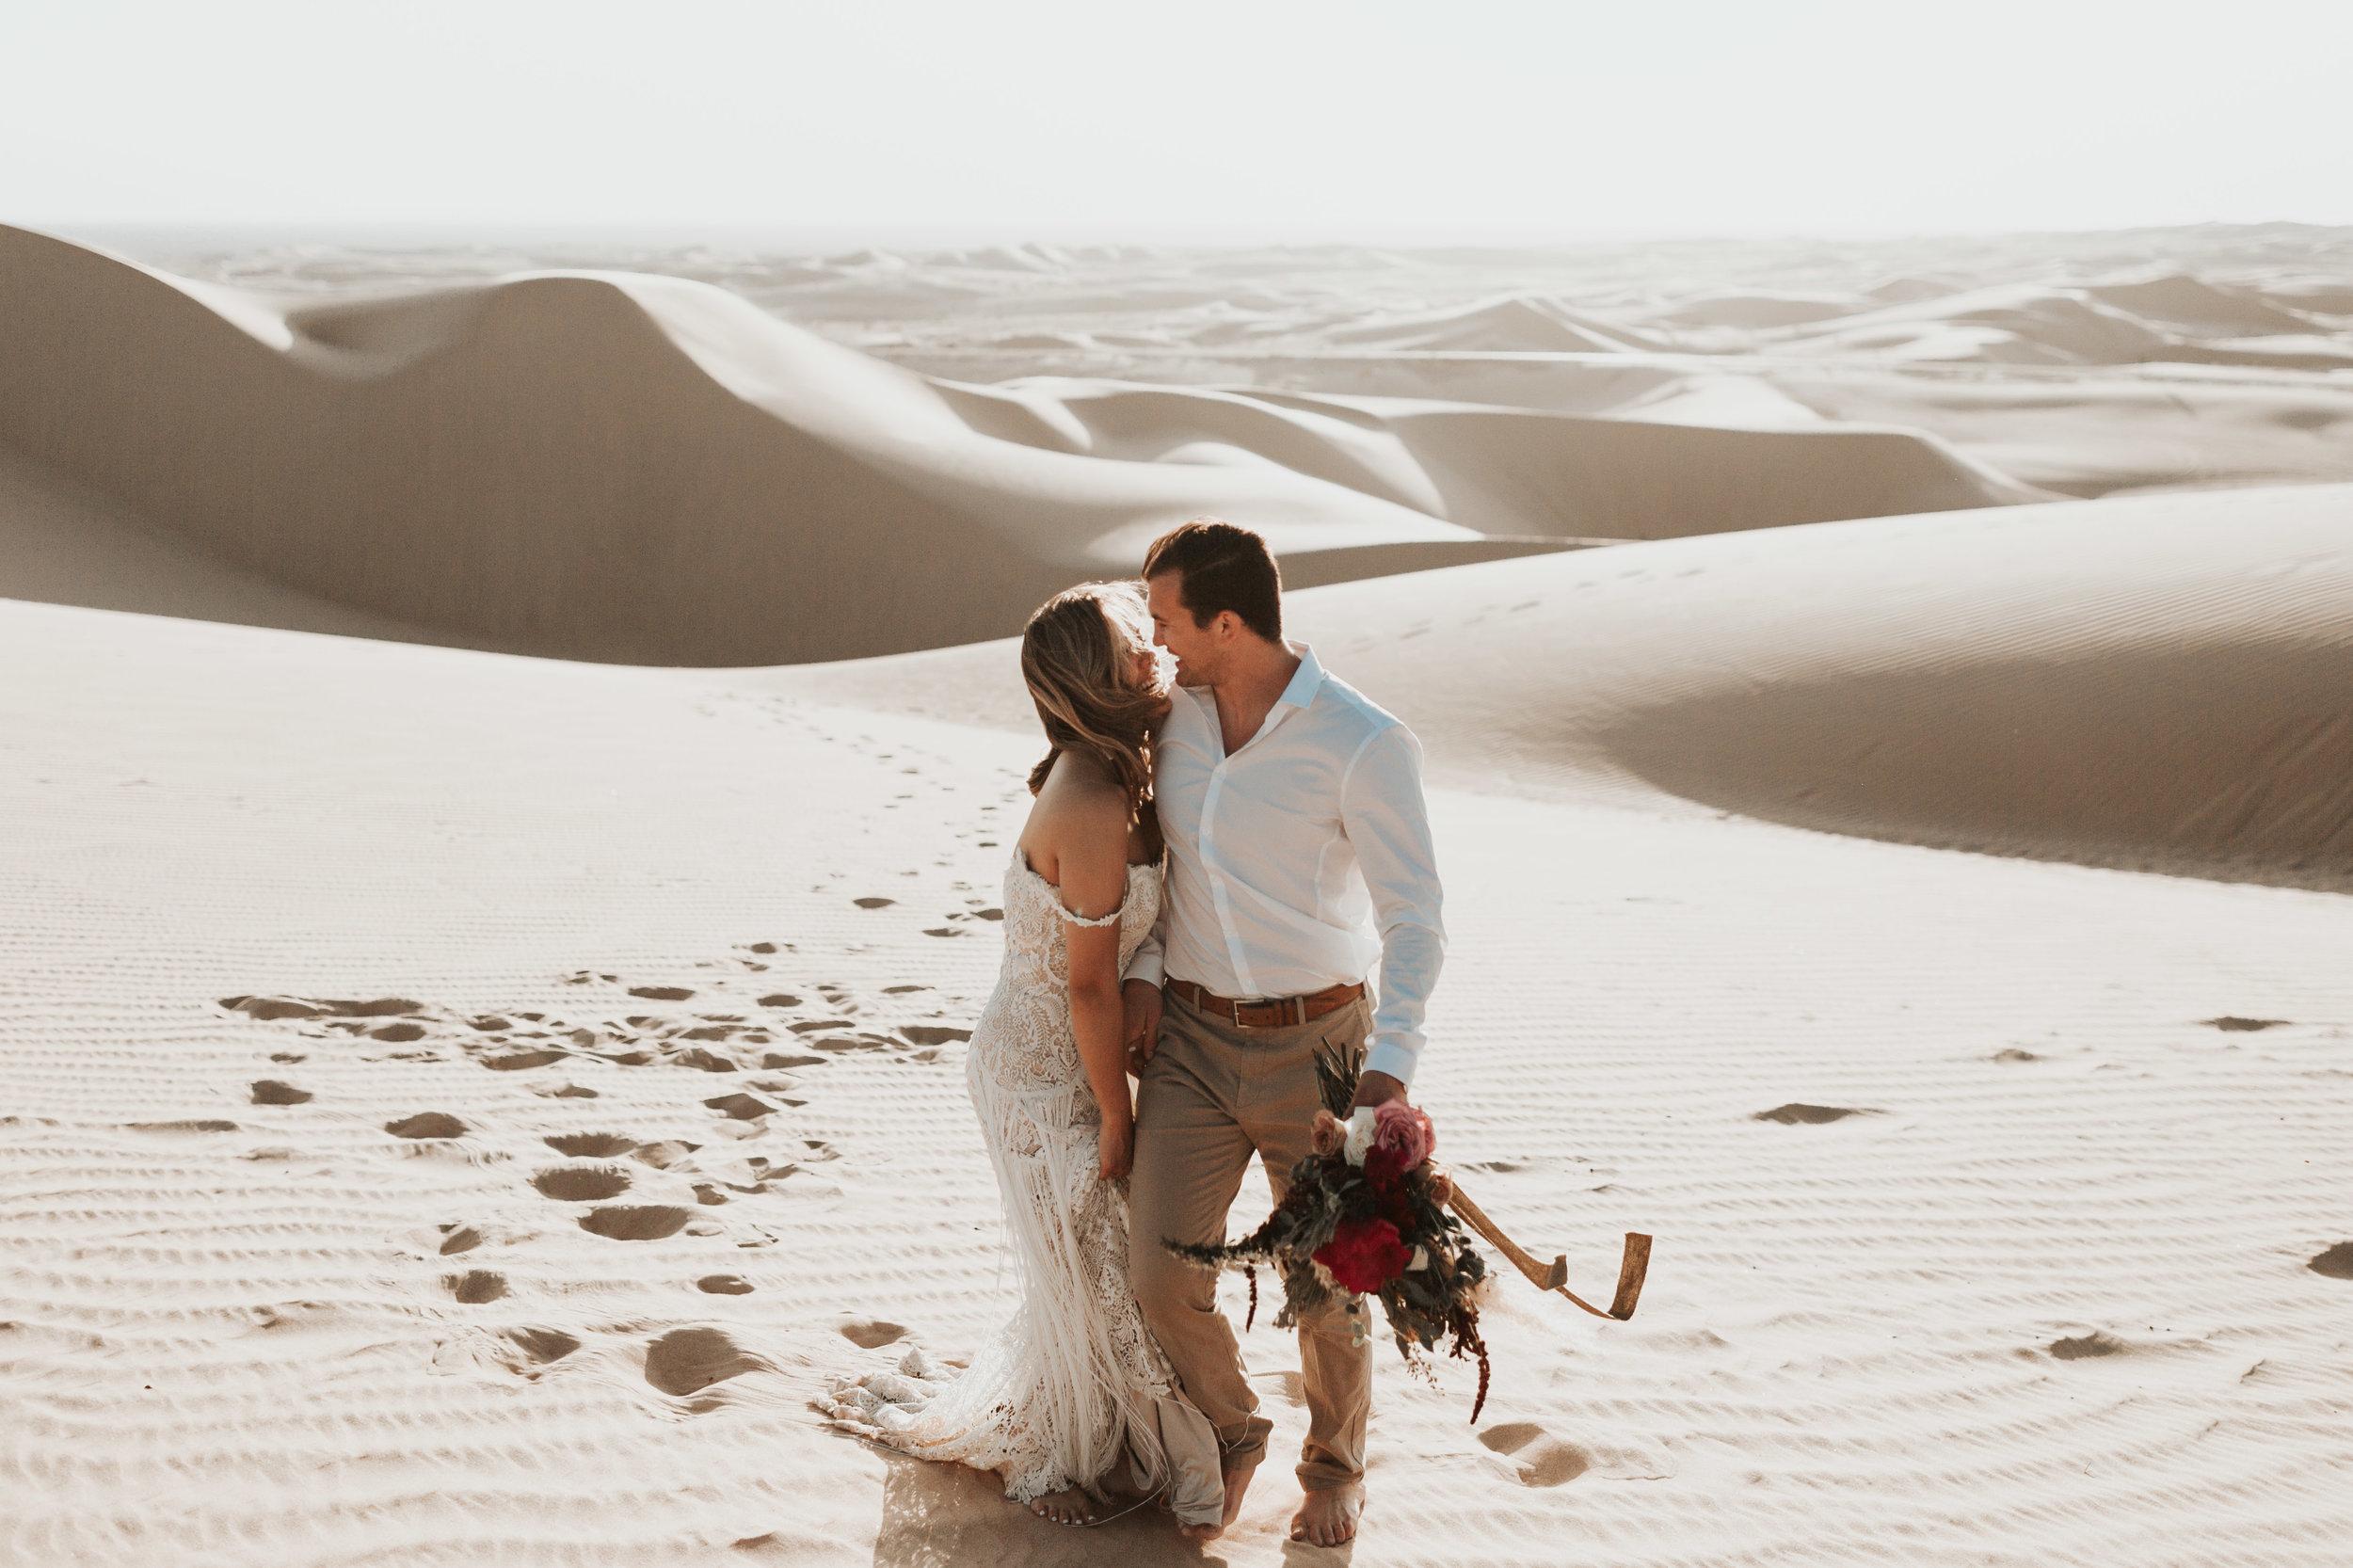 imperial sand dunes destination styled elopement